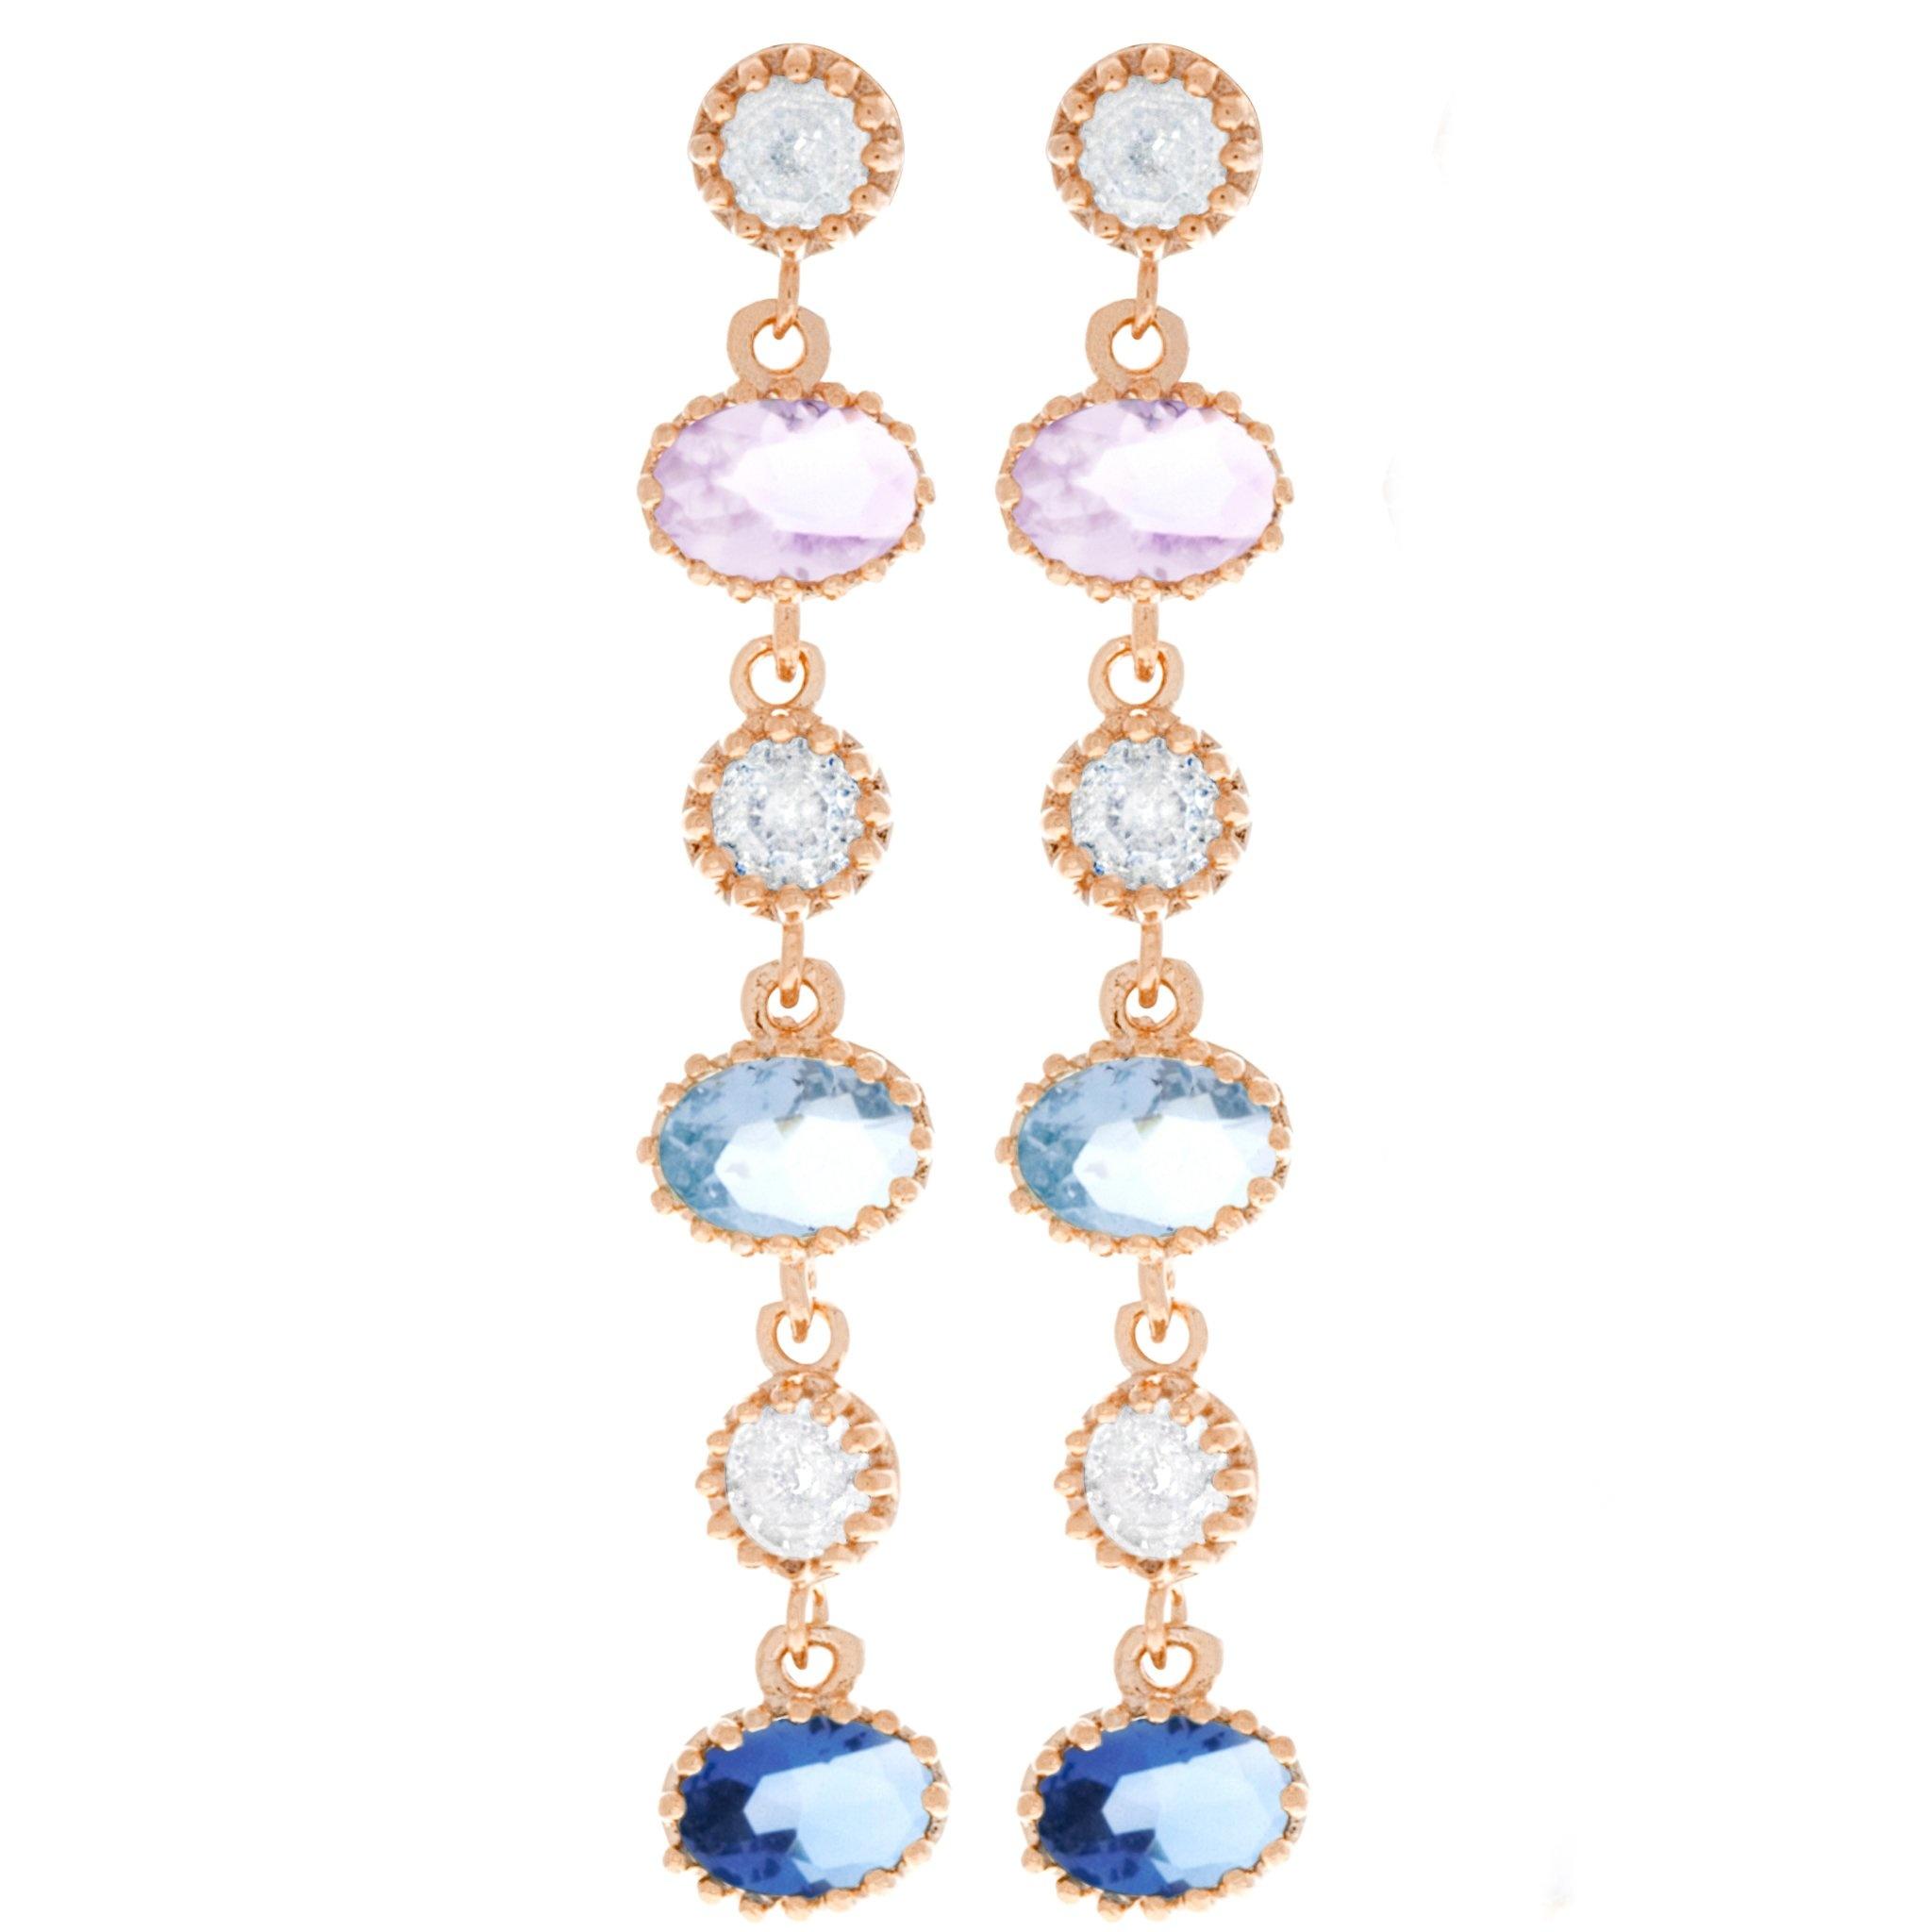 Cinderella Dangle Earrings Rose Gold